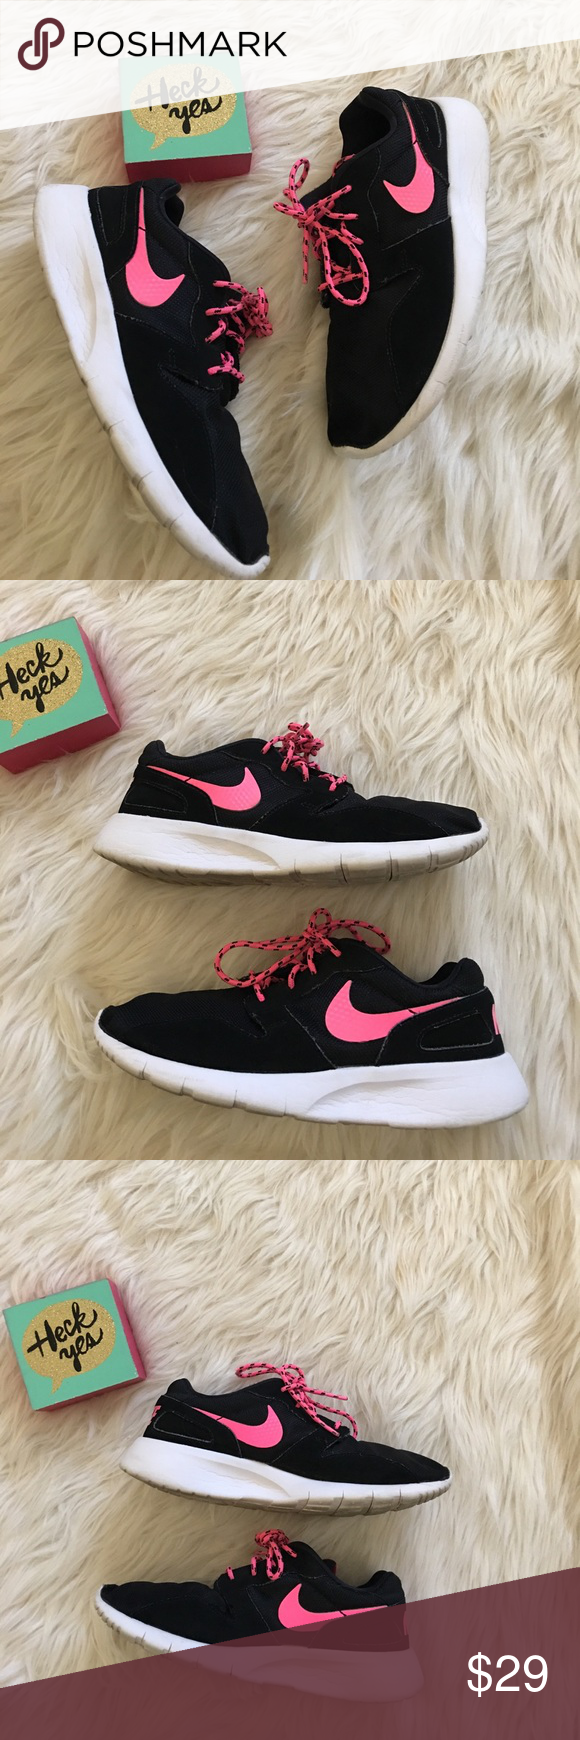 NIKE  blue & pink shoes size 6.5 EUC